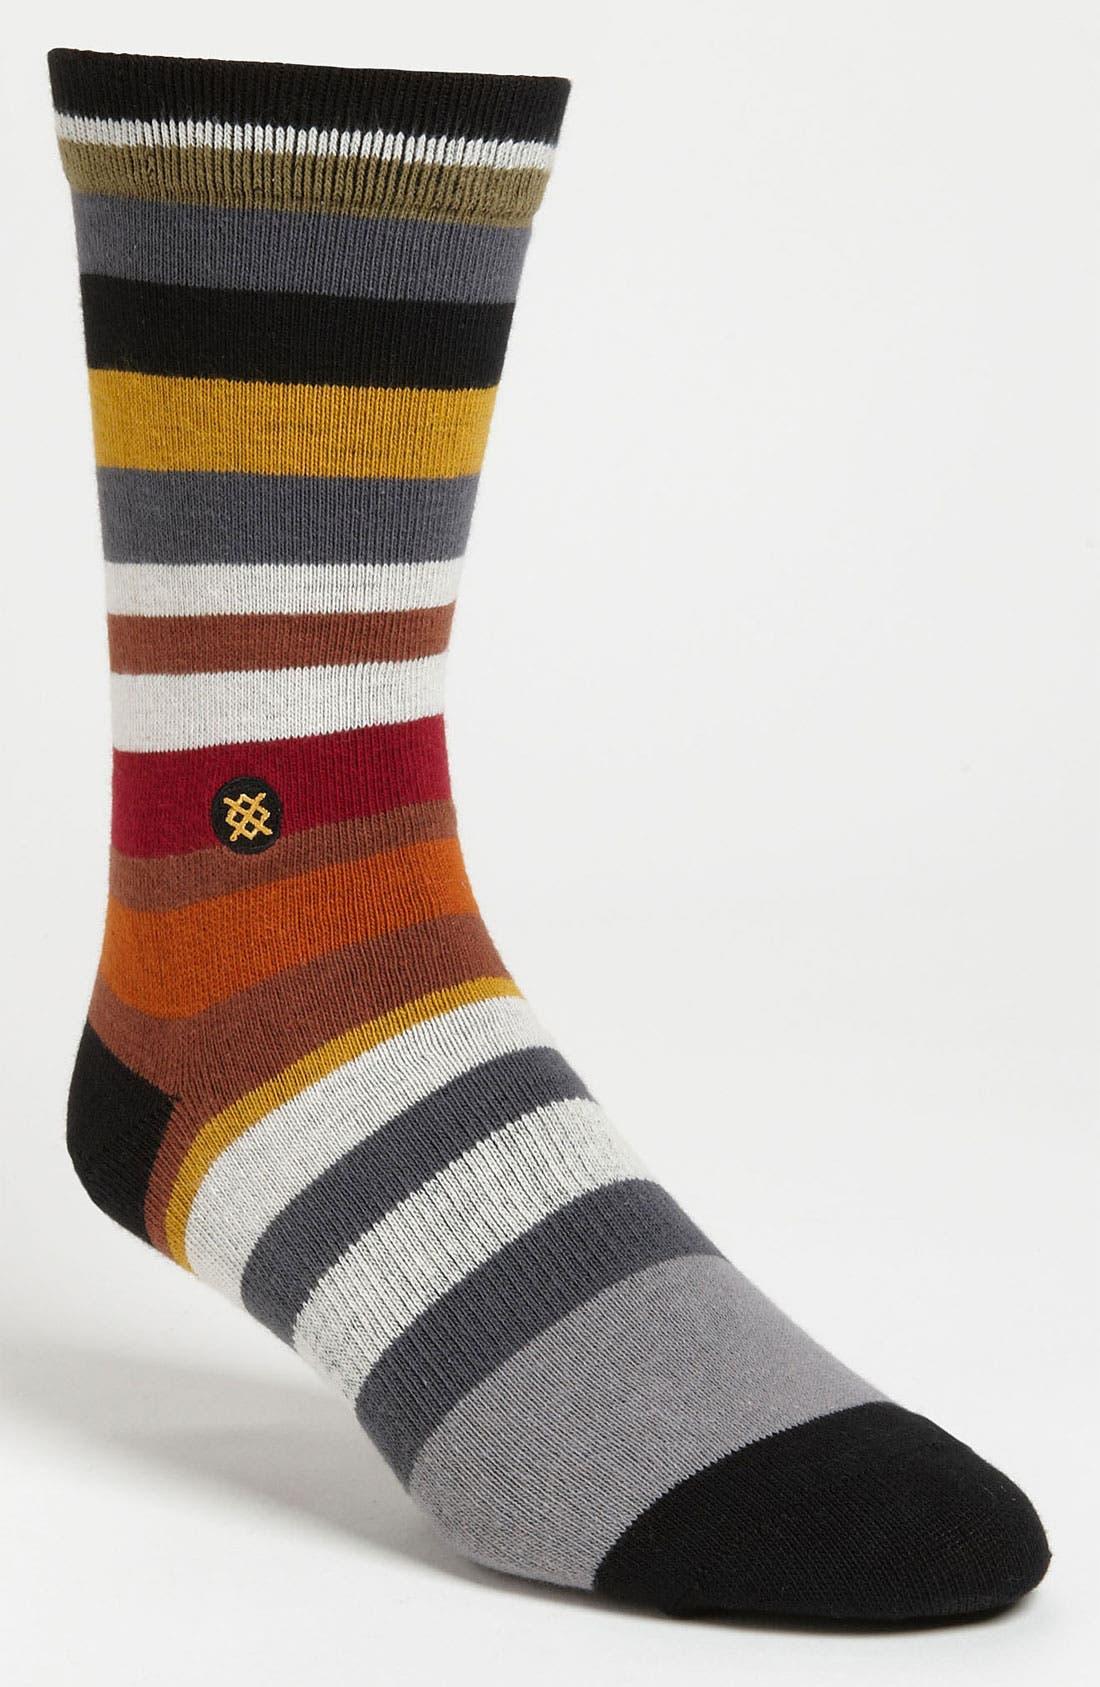 Main Image - Stance 'Cannon' Socks